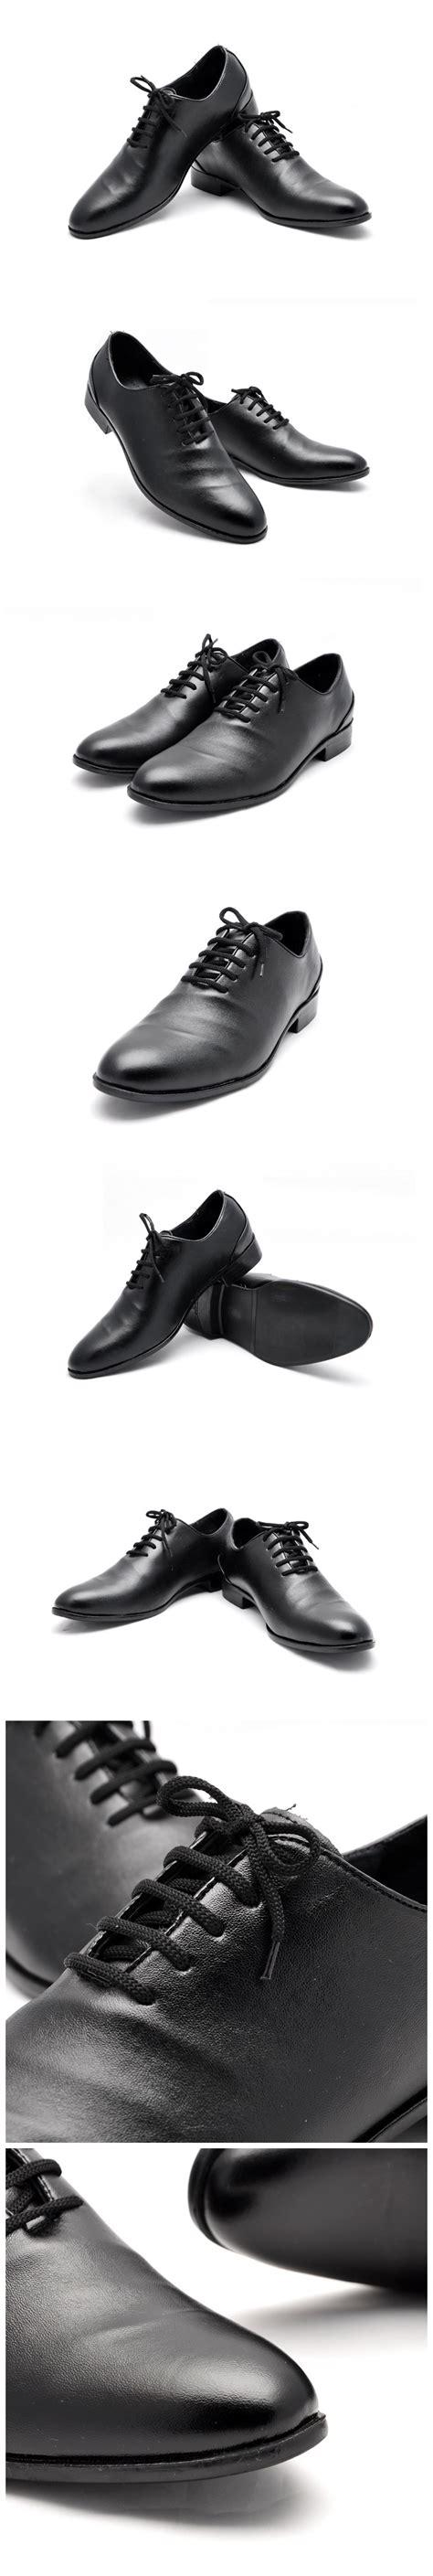 Sepatu Pria E 018 sepatu kantor pria model lancip